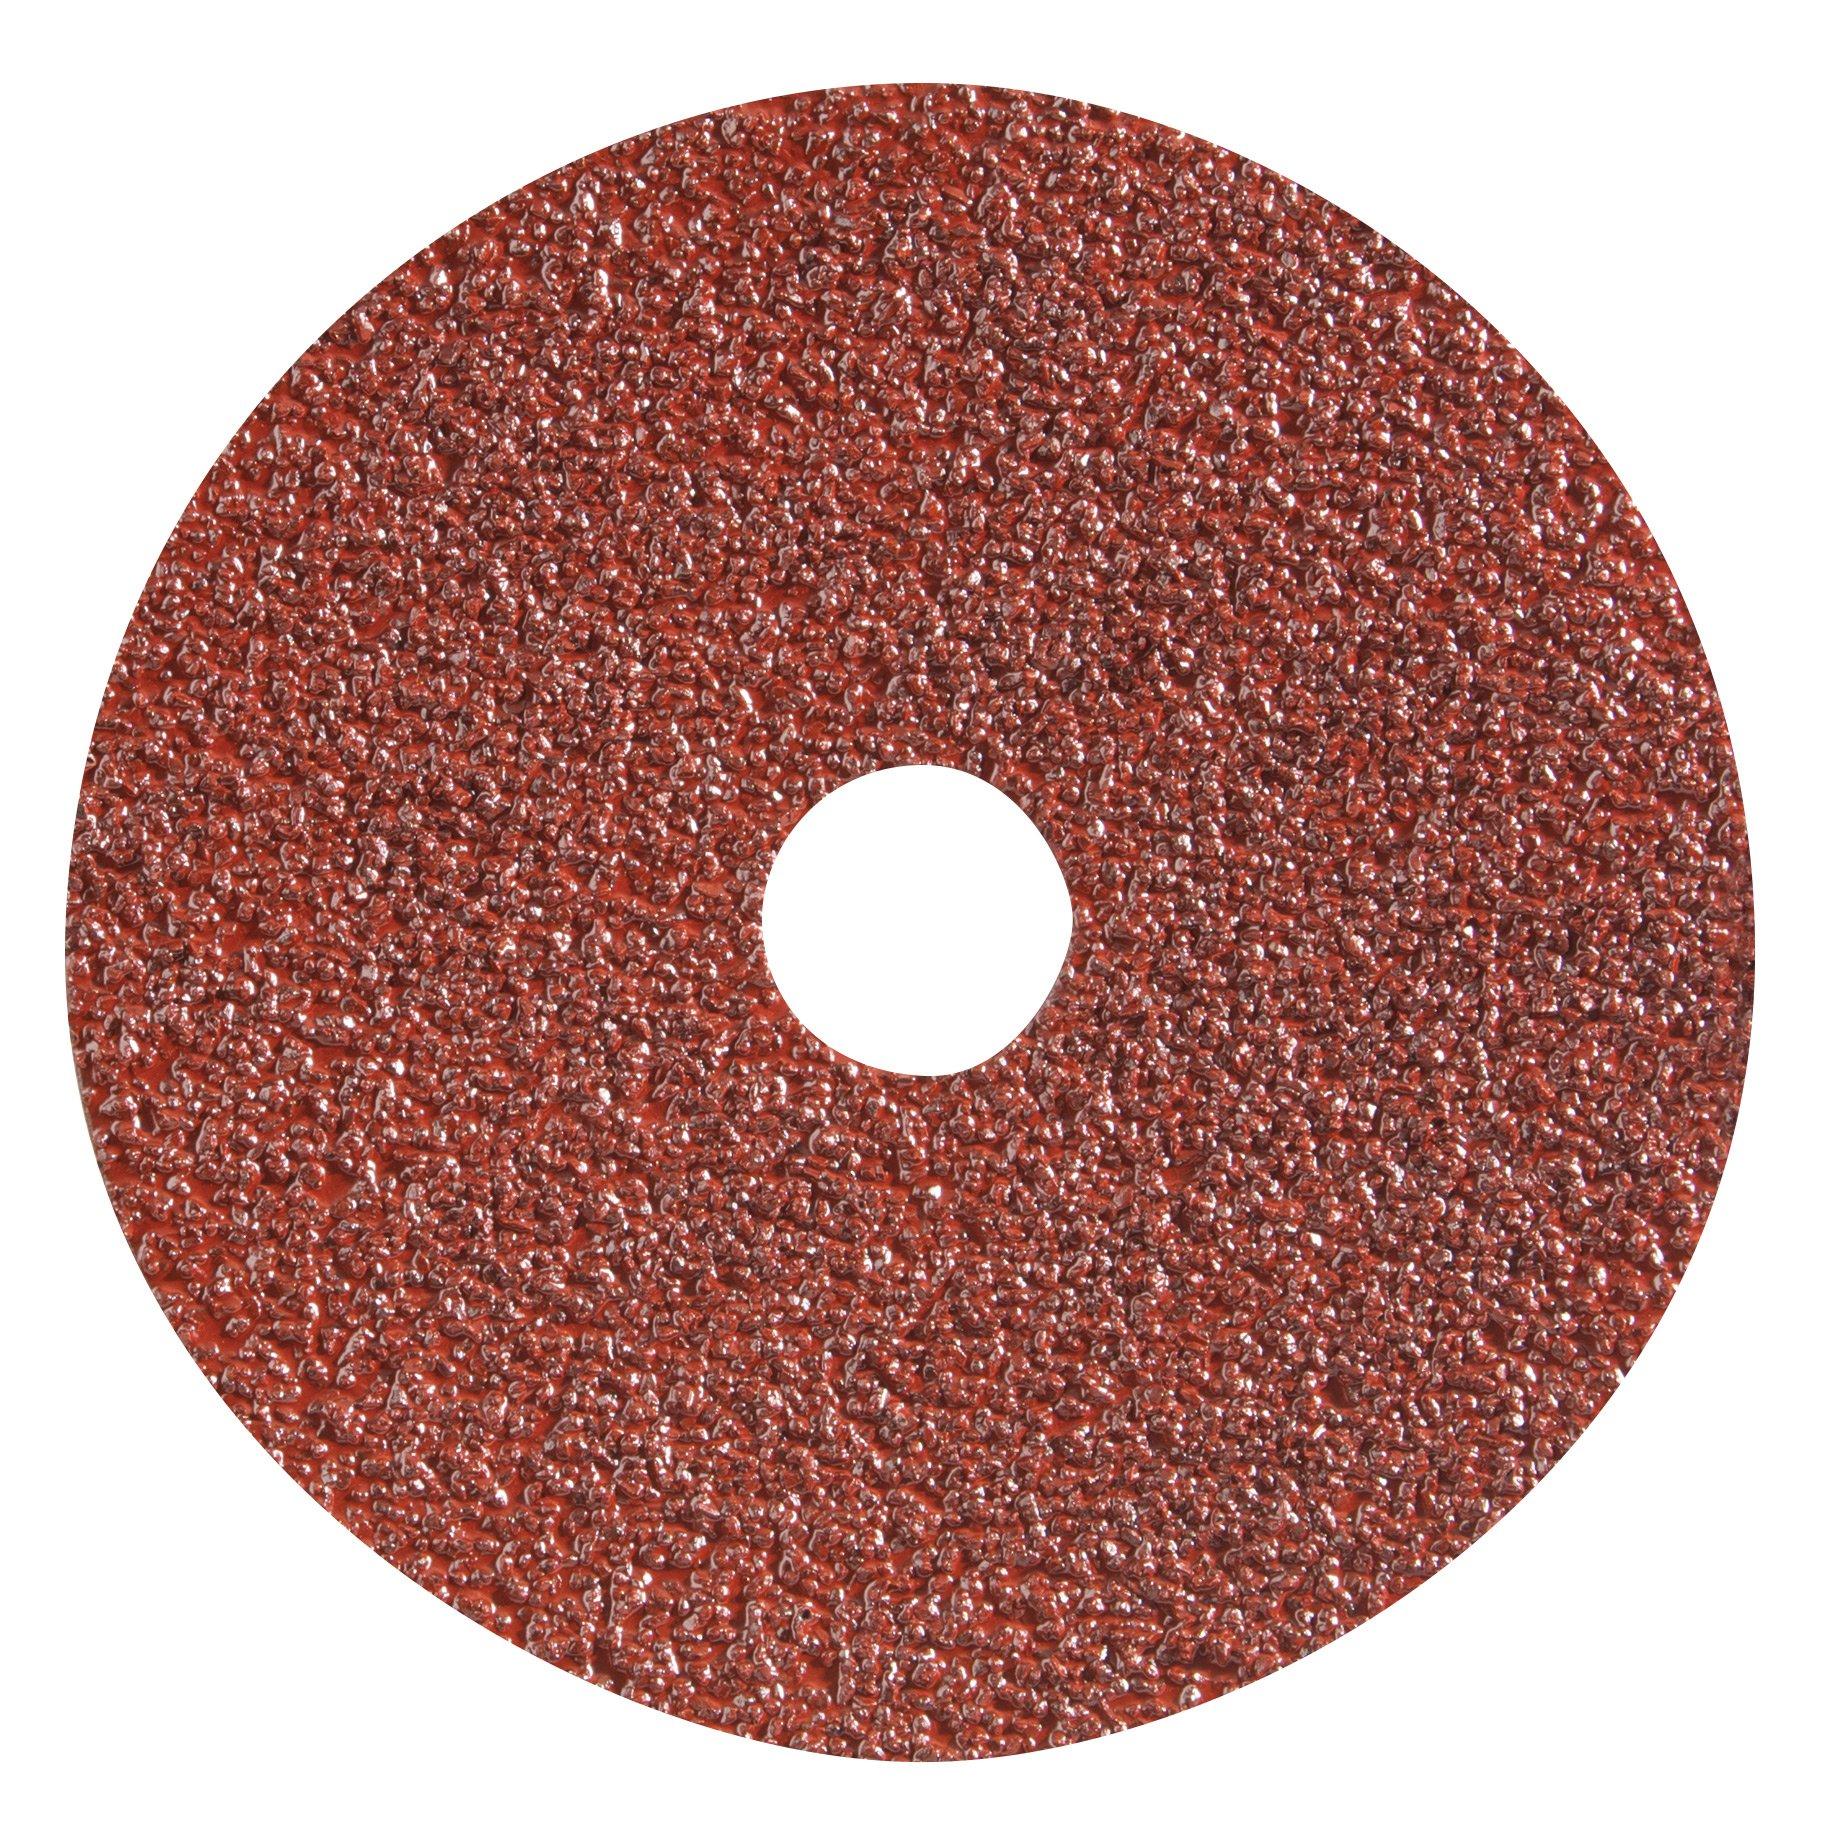 "Spiralcool C-4'' x5/8-60 All Purpose Resin Fiber Discs, ""C"" Type- Aluminum Oxide, 60 Grit (Pack of 25)"